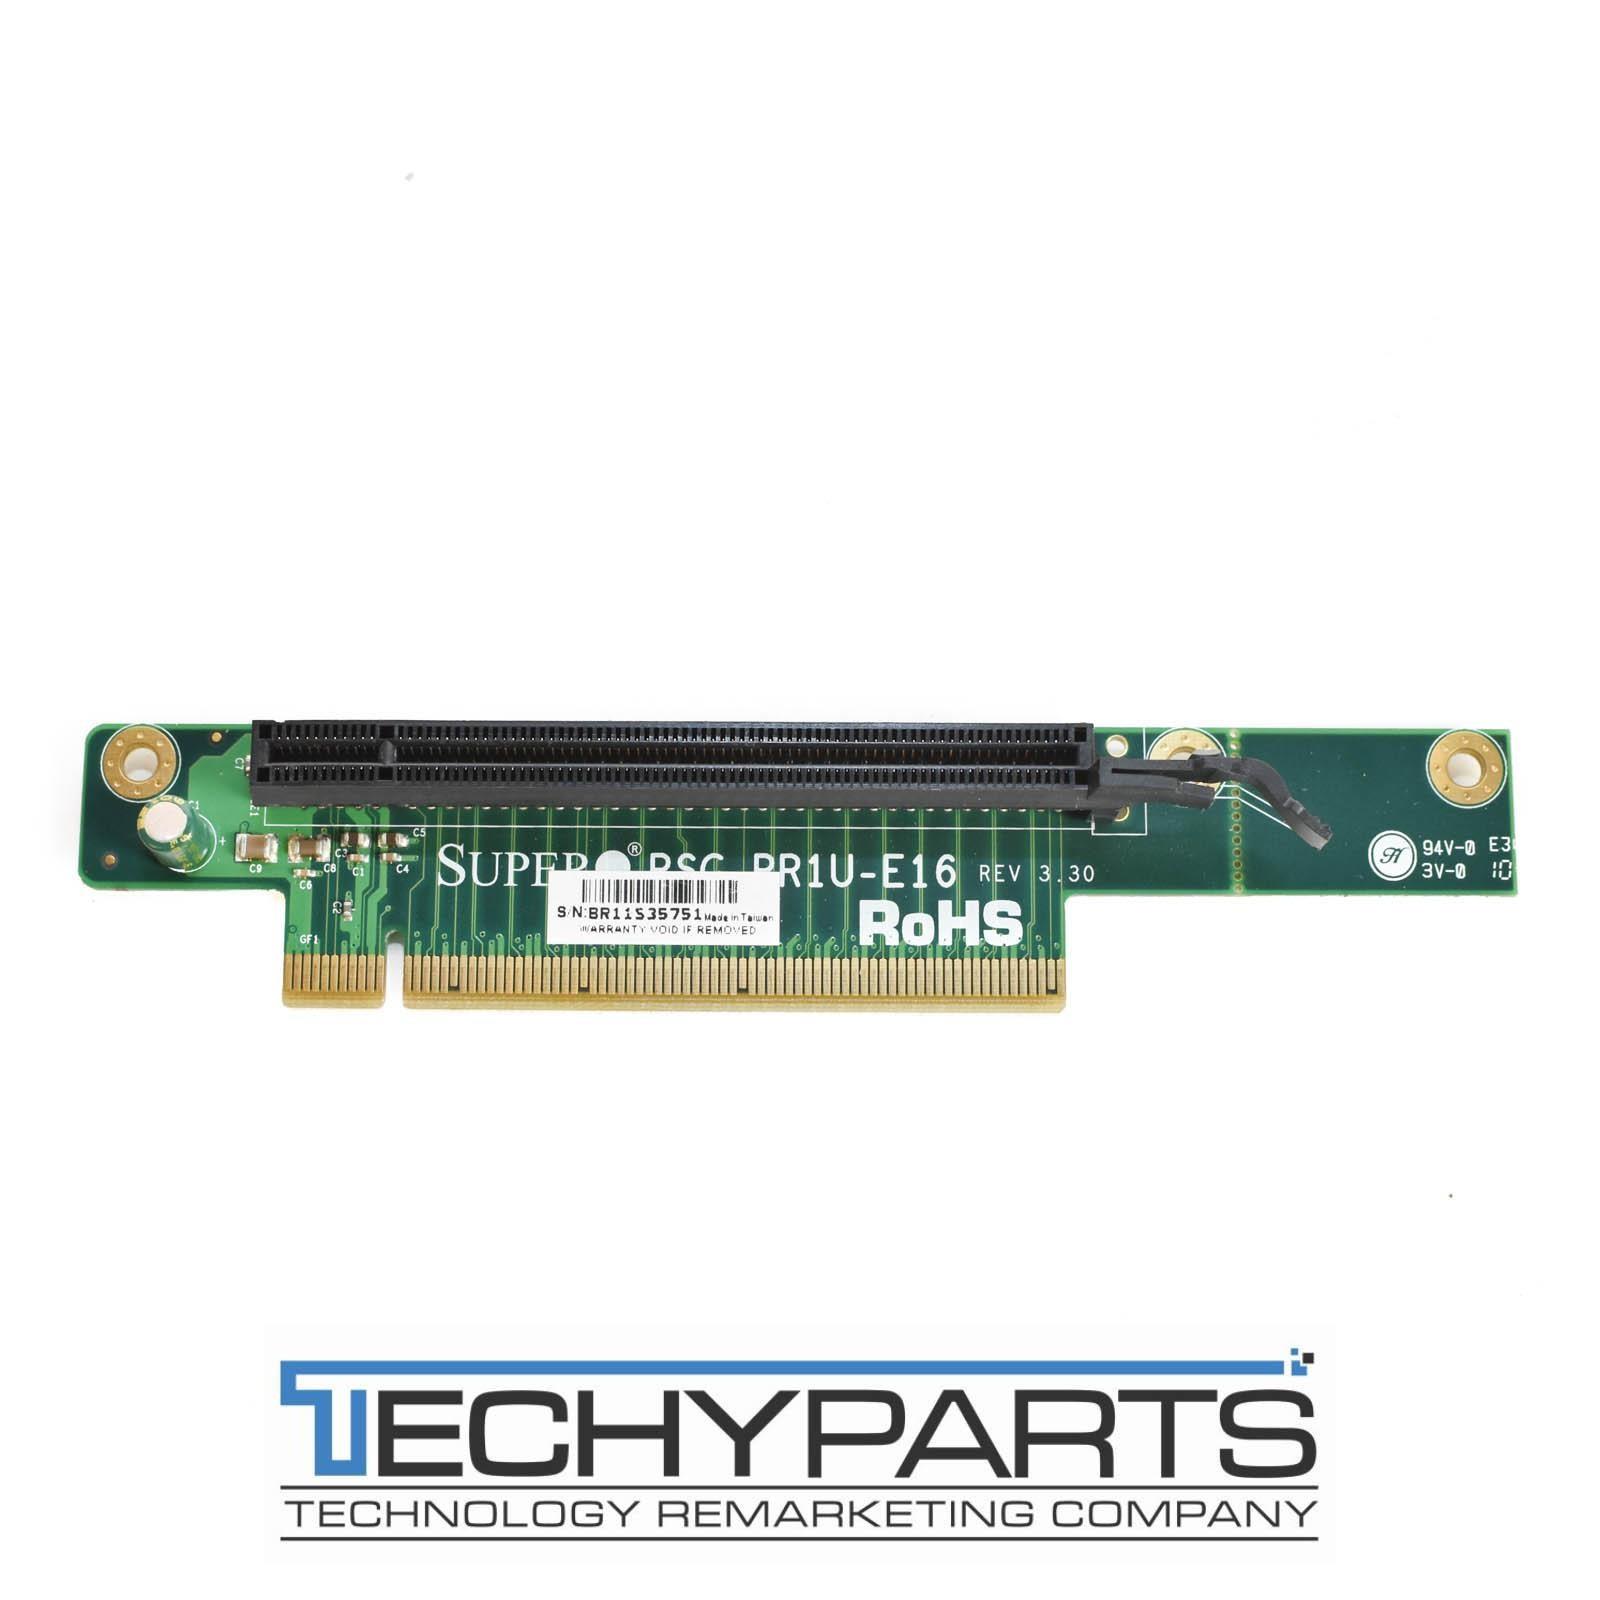 Supermicro Rsc Rr1u E16 1u Pci E X16 Riser Card 30